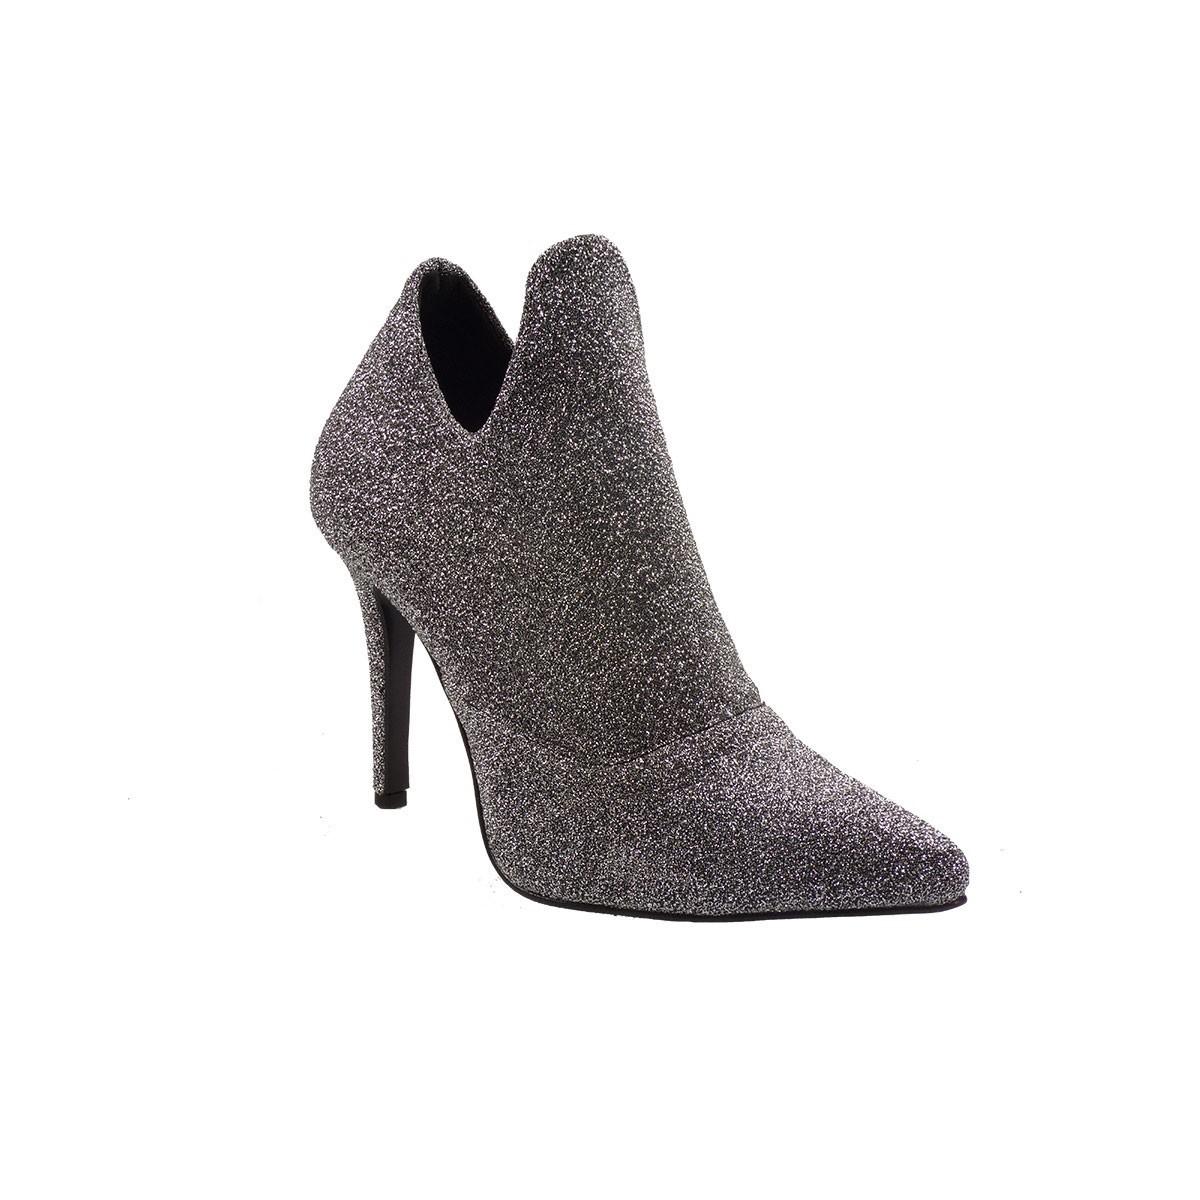 Katia Shoes Γυναικεία Παπούτσια Μποτάκια 47-4807 Ατσαλί Μεταλλικό Λίκρα